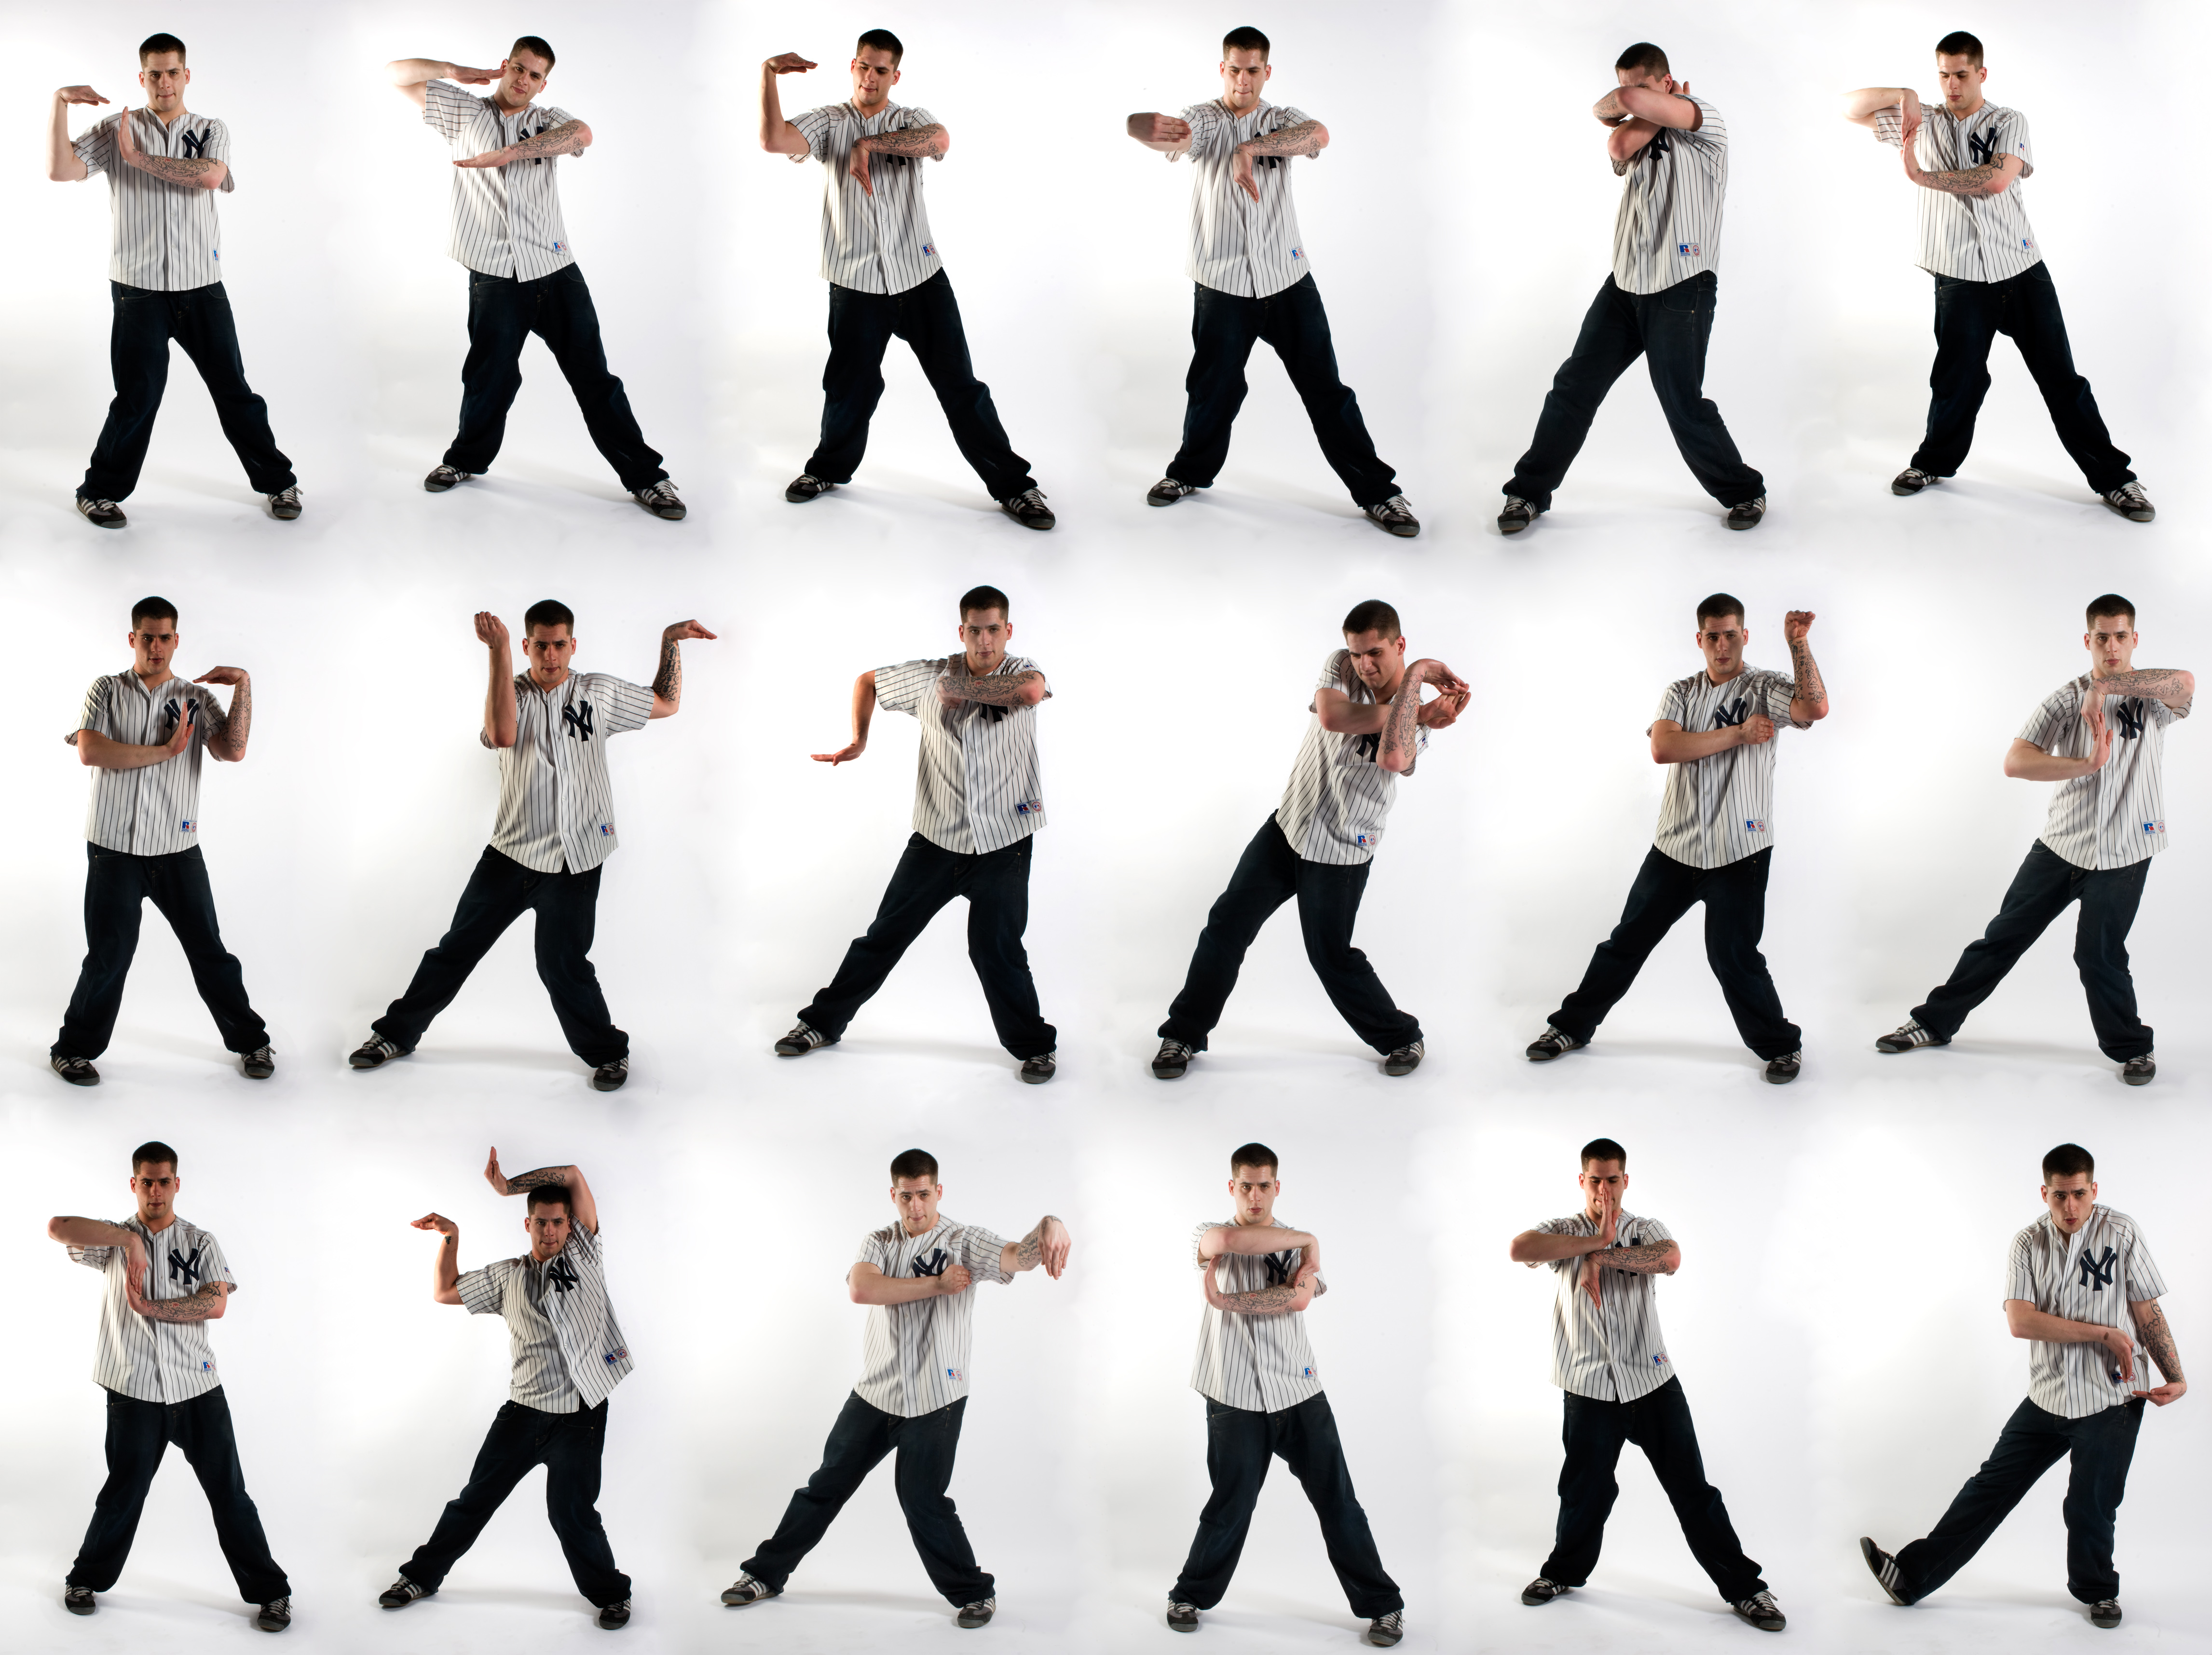 Движения для танца хип-хоп картинки